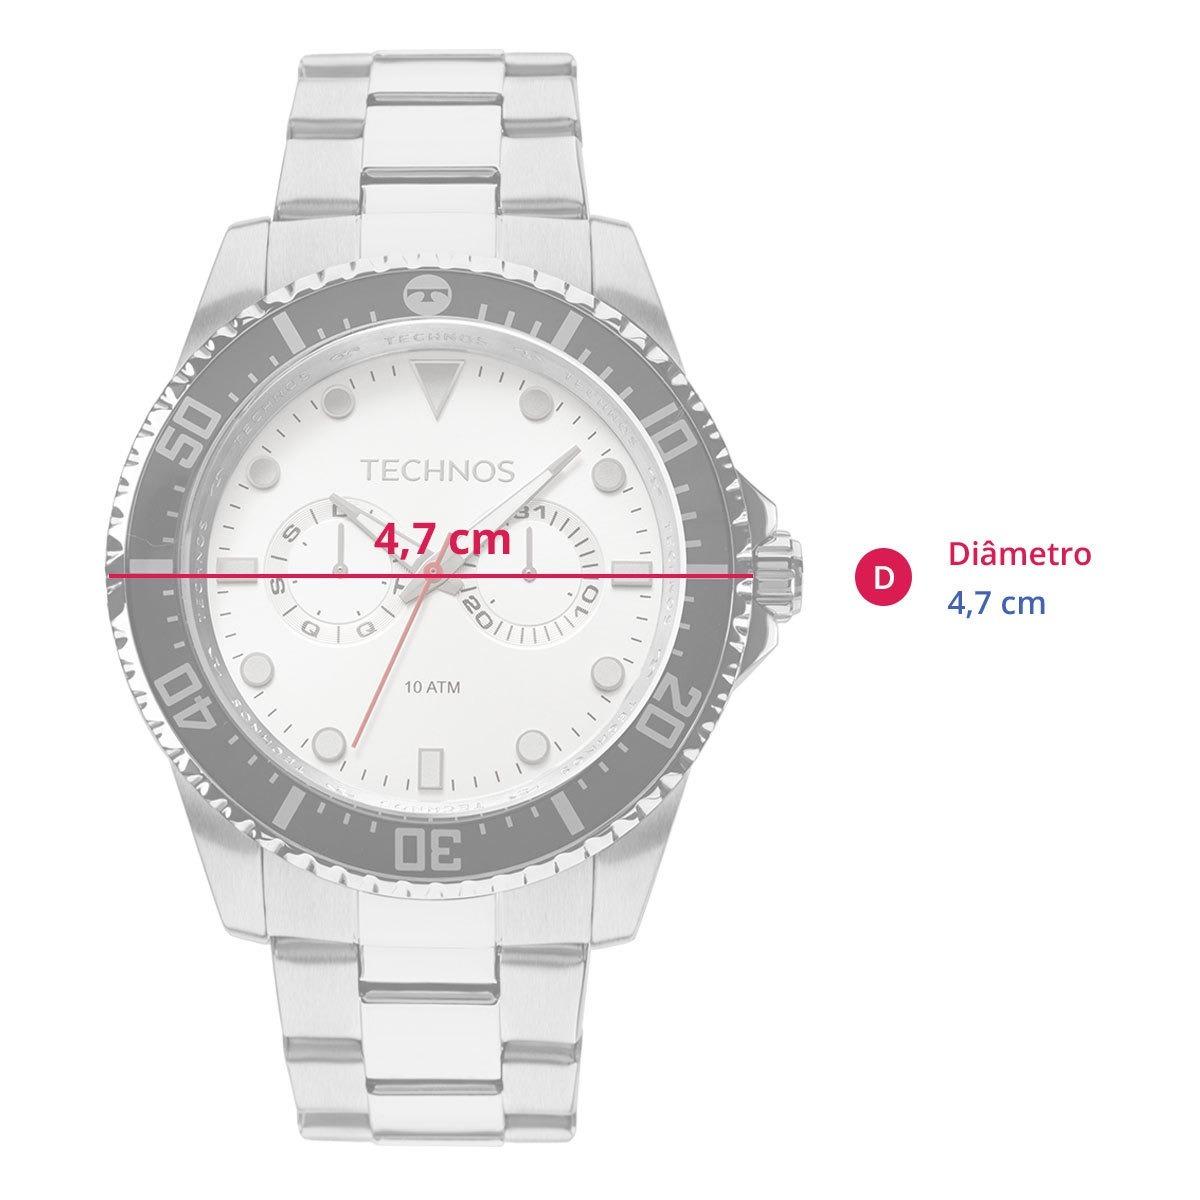 Relógio Technos Skymaster Masculino Prata Analógico 6p25bm 1 - R ... df15b7b51d